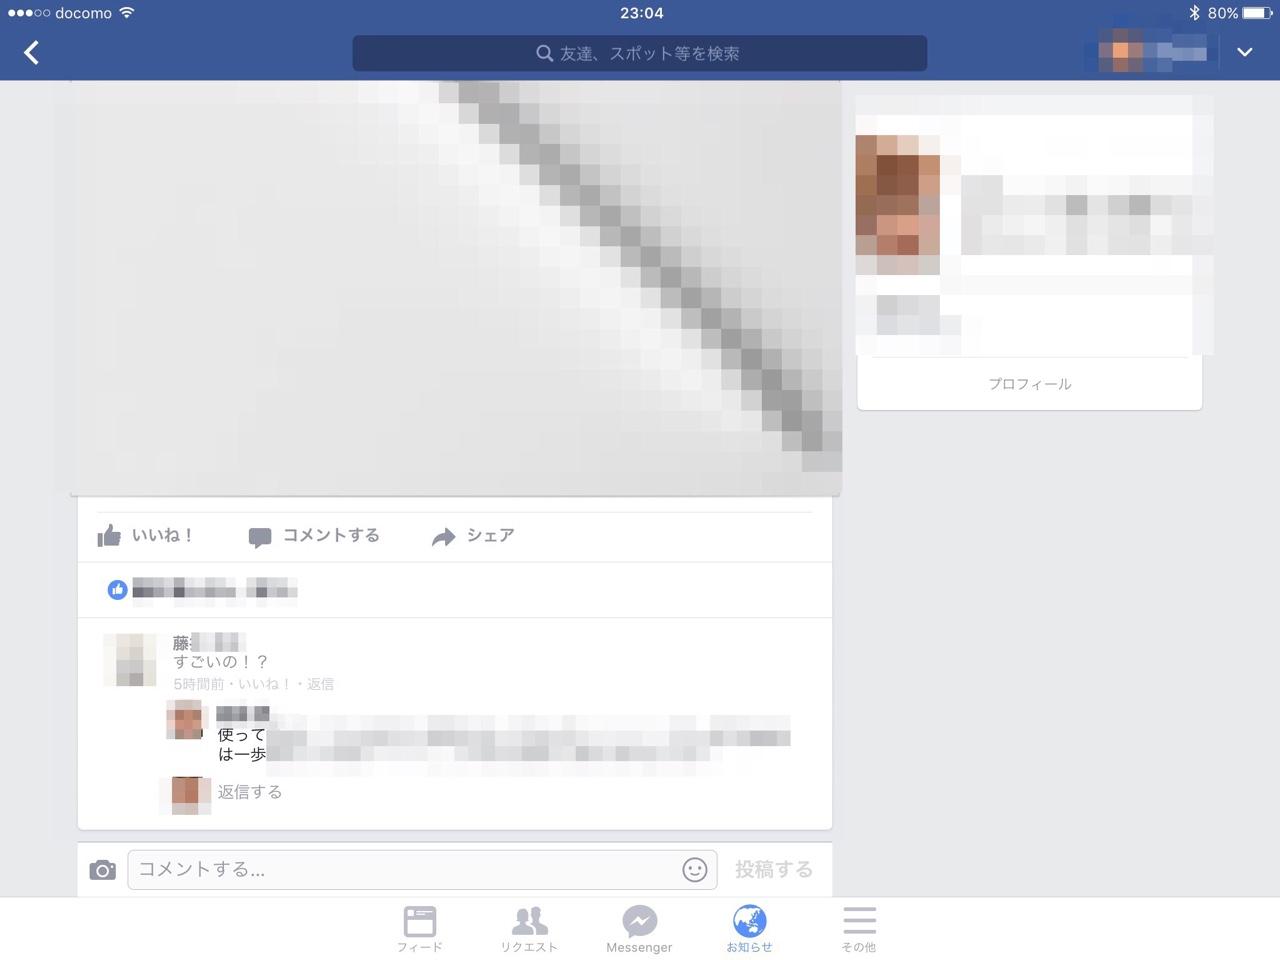 Facebook コメント 薄い